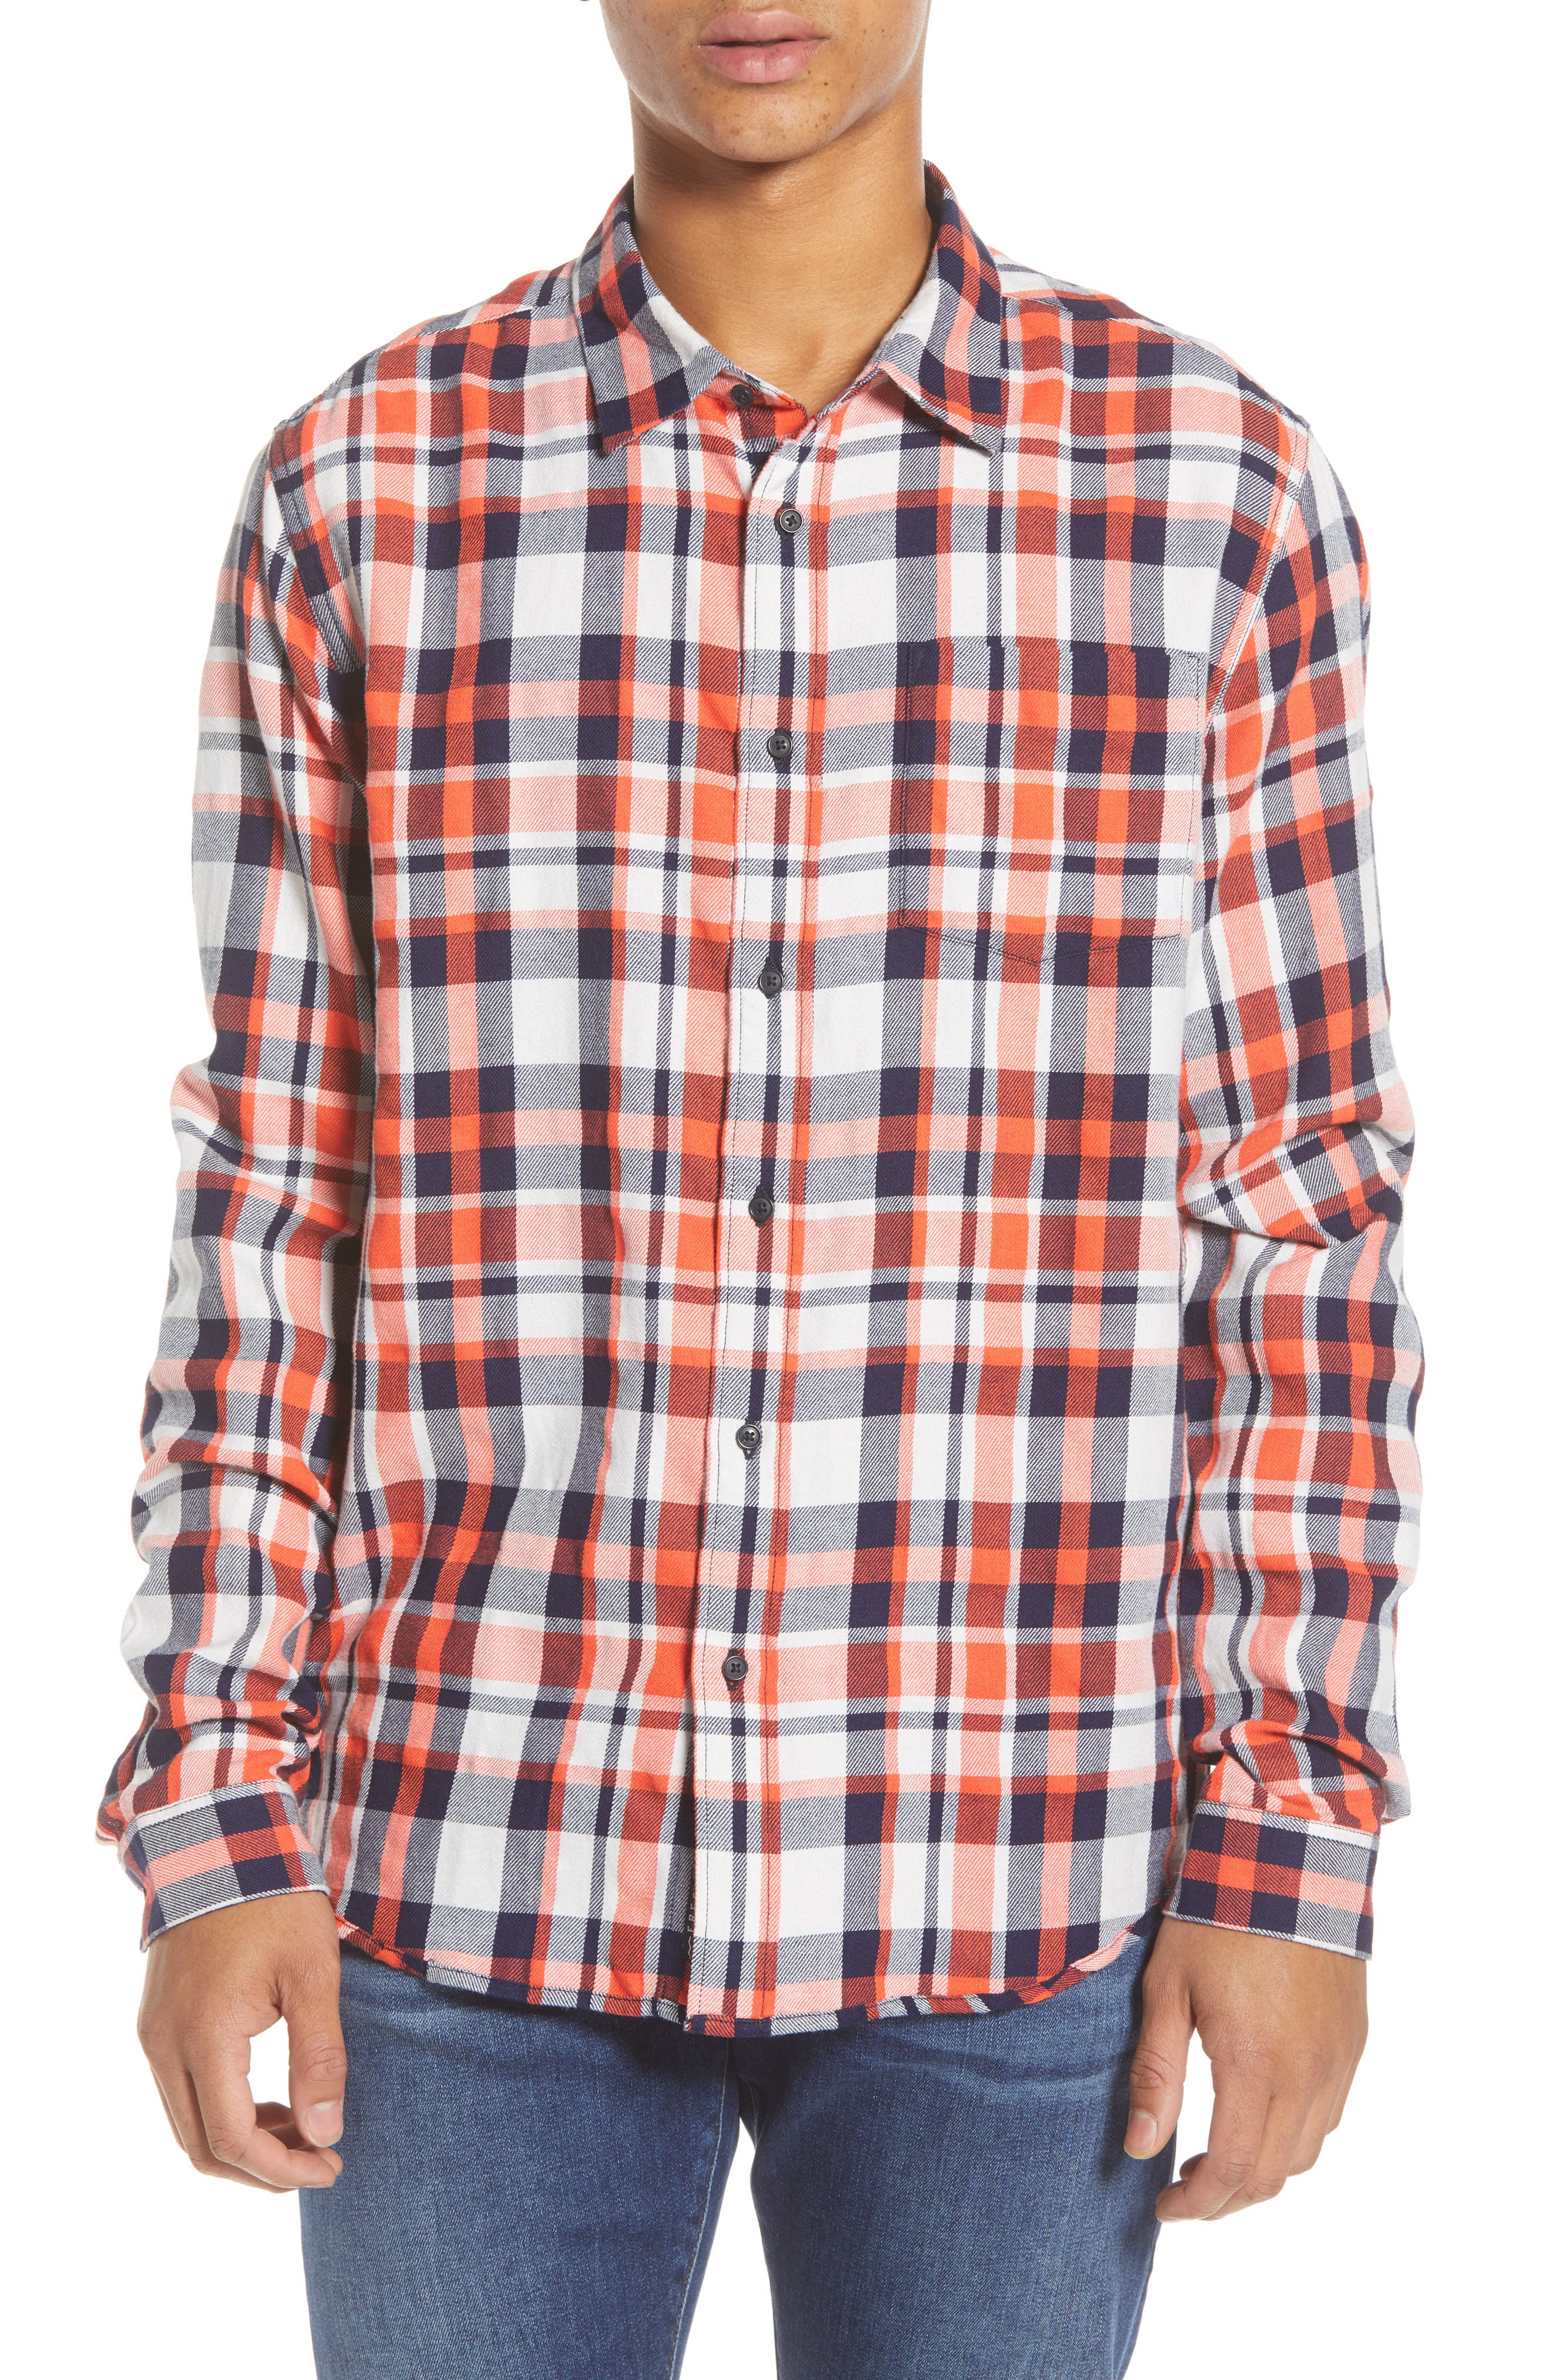 Scotch & Soda Plaid Button-Up Flannel Shirt, Red